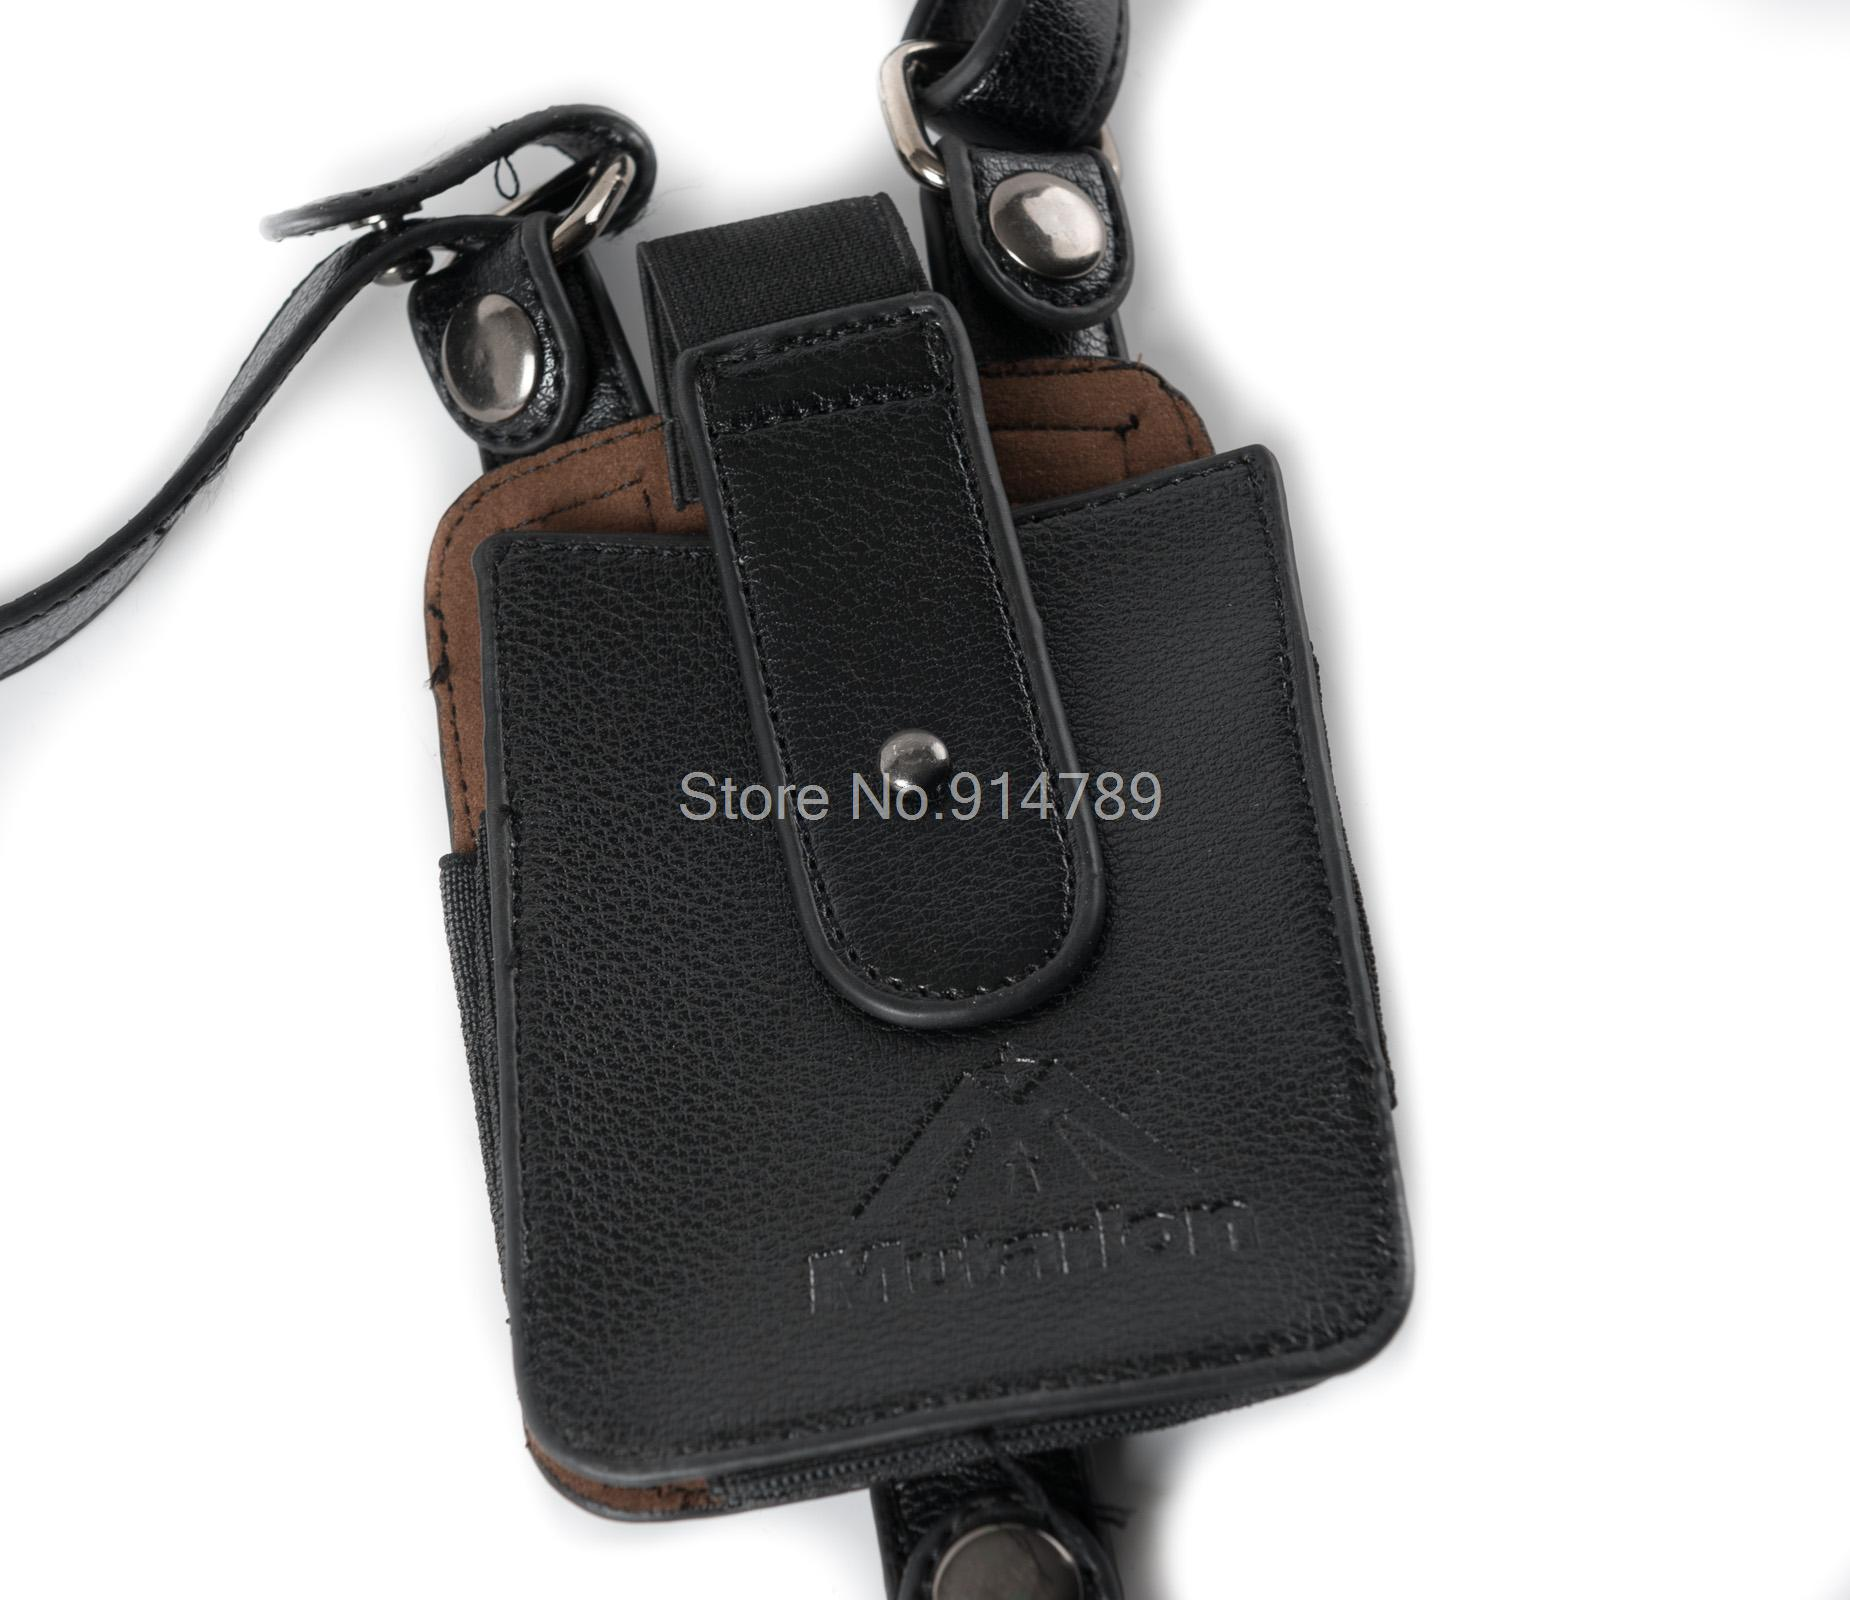 LEATHER ANTI-THEFT HIDDEN UNDERARM HOLSTER STYLE SHOULDER WALLET PHONE BAG BLACK-35788